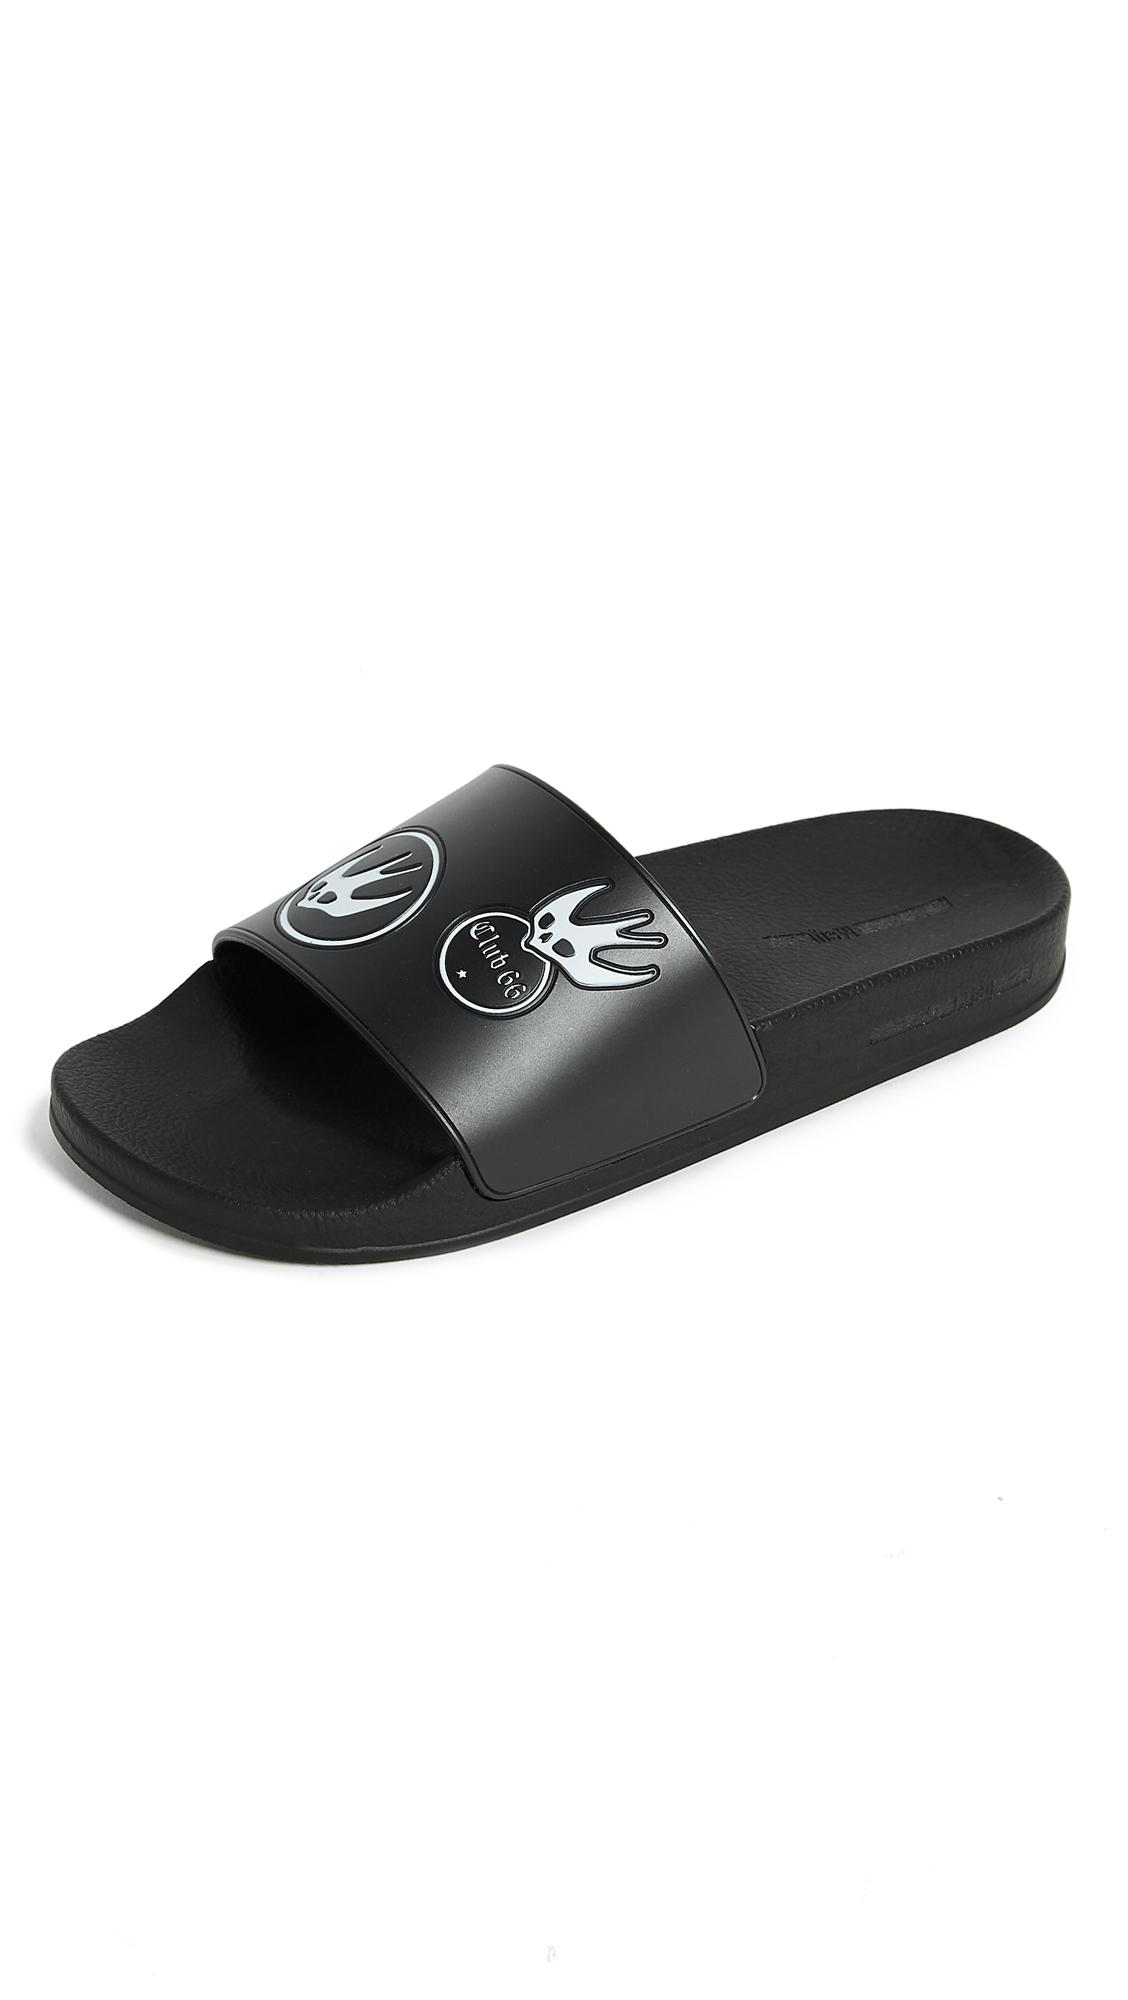 McQ - Alexander McQueen Swallow Slide Sandals